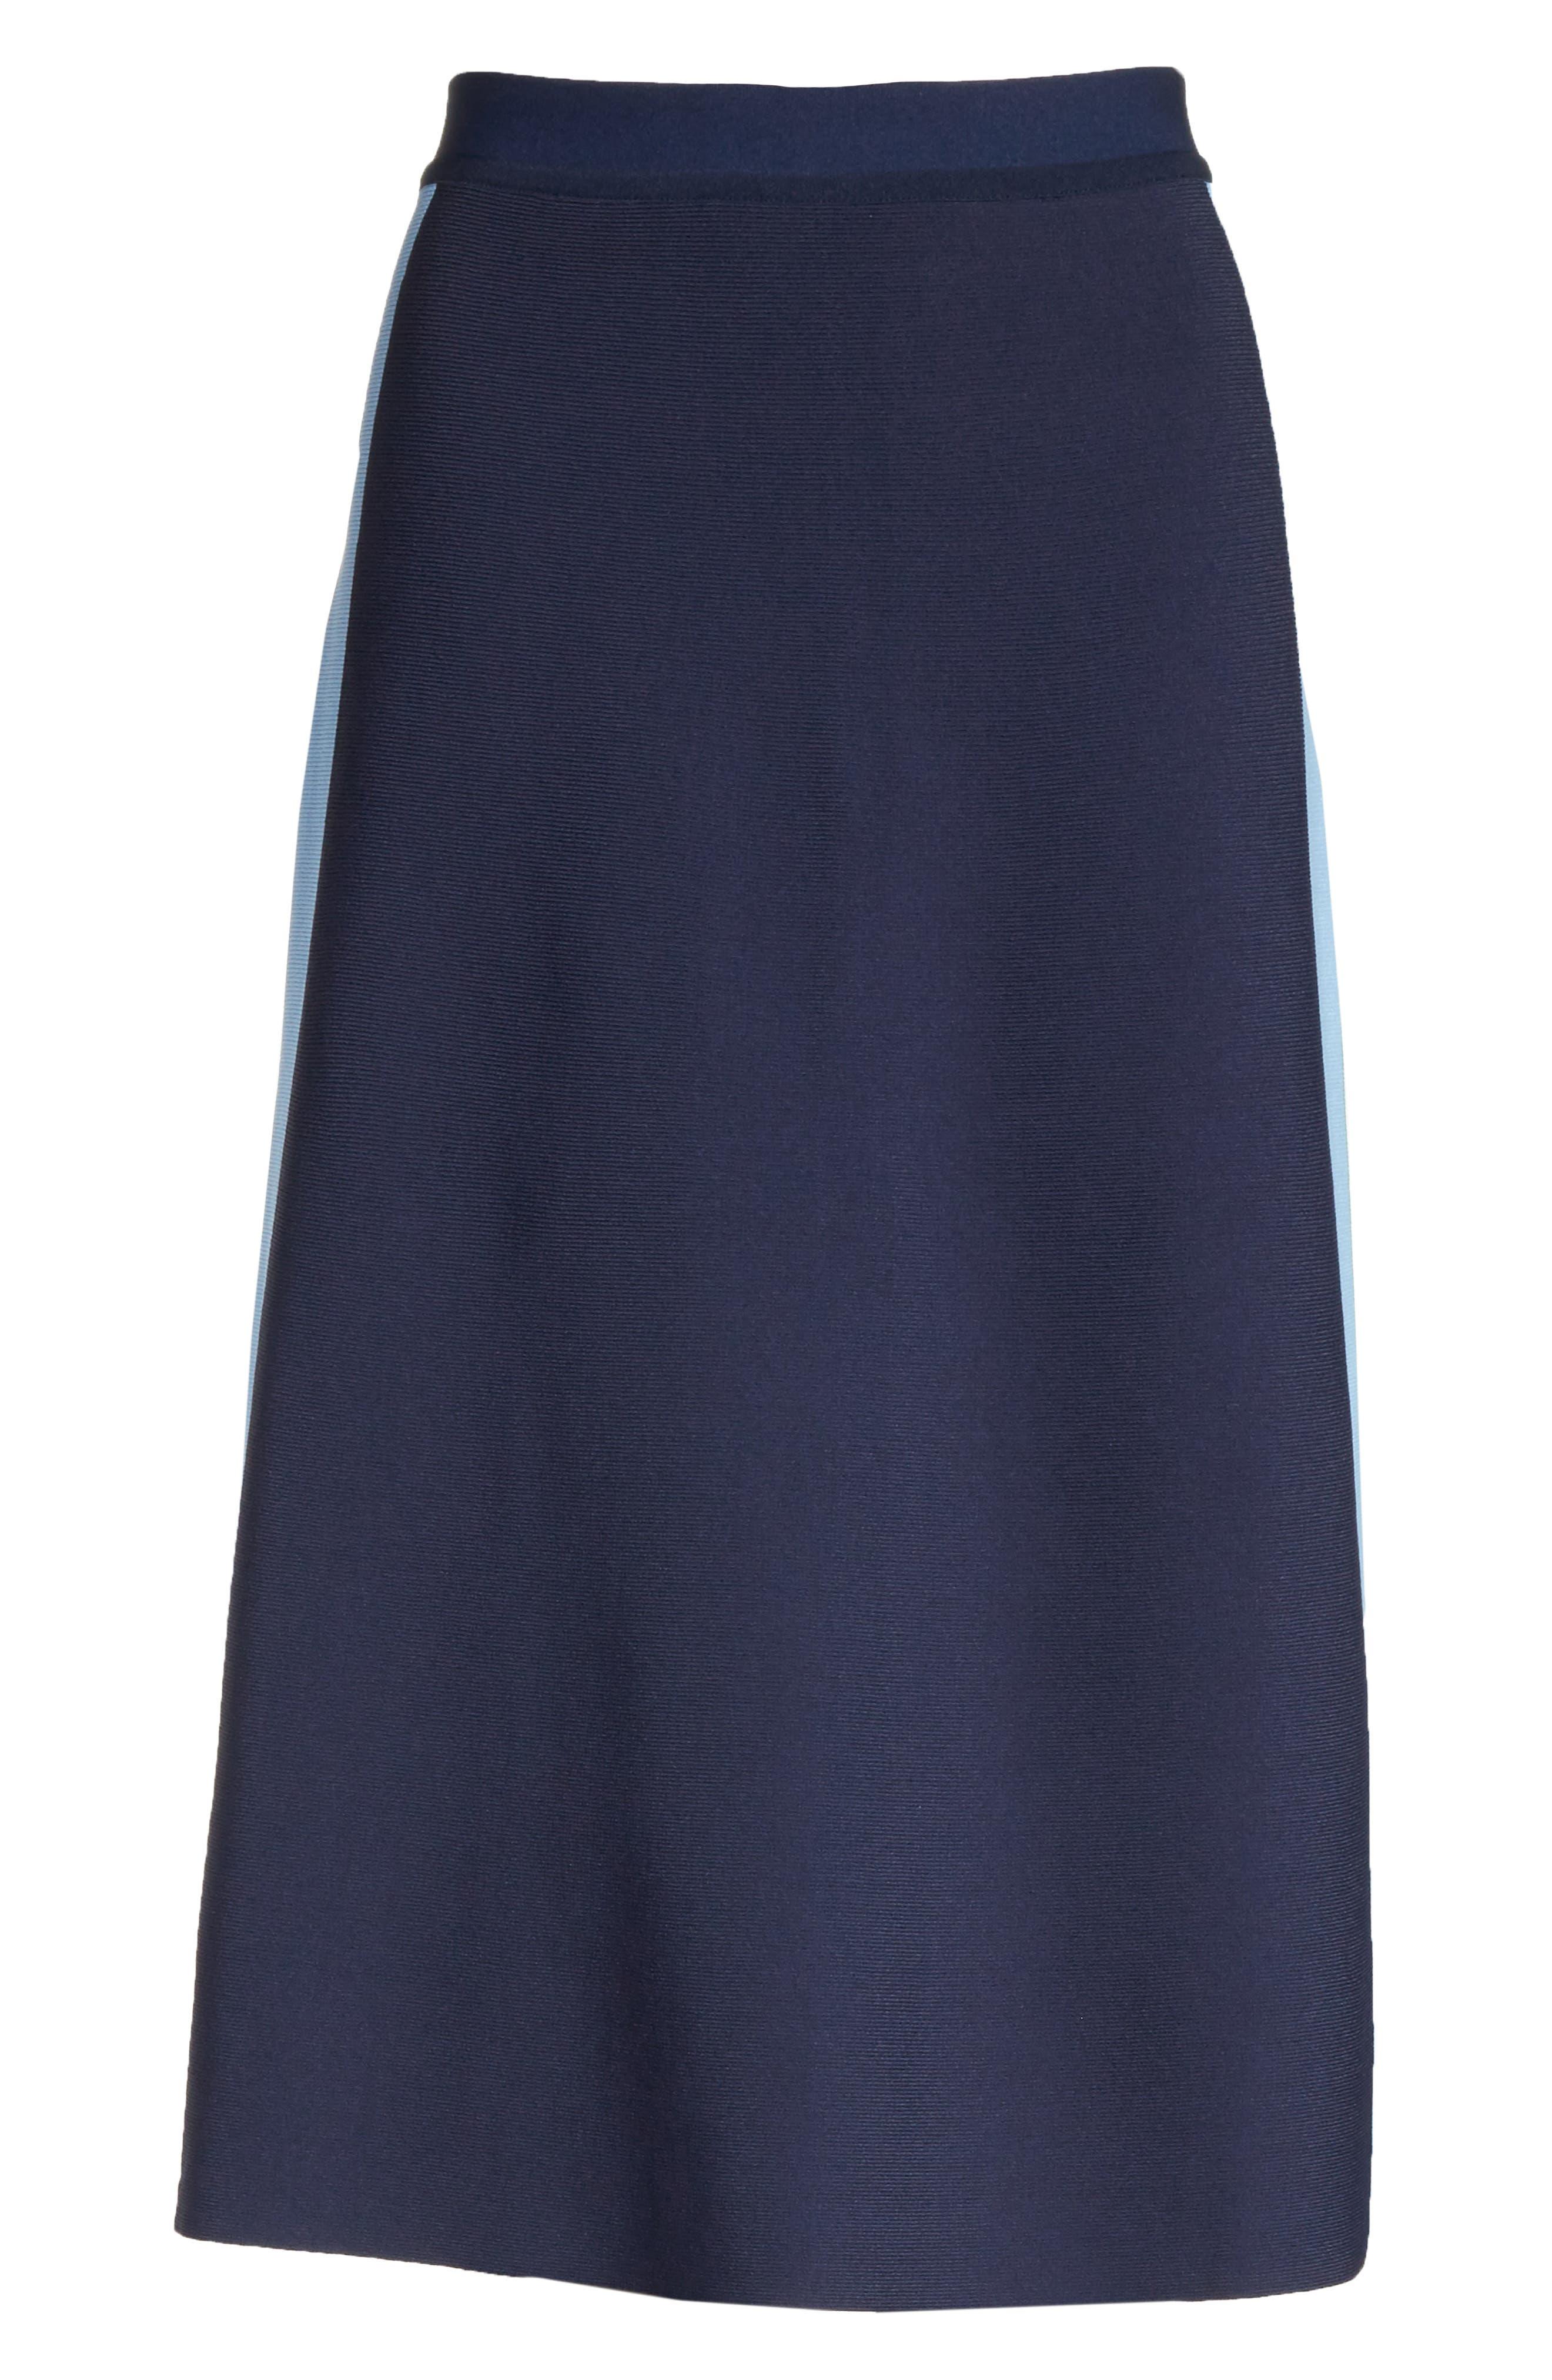 Tech Knit Colorblock Skirt,                             Alternate thumbnail 6, color,                             405